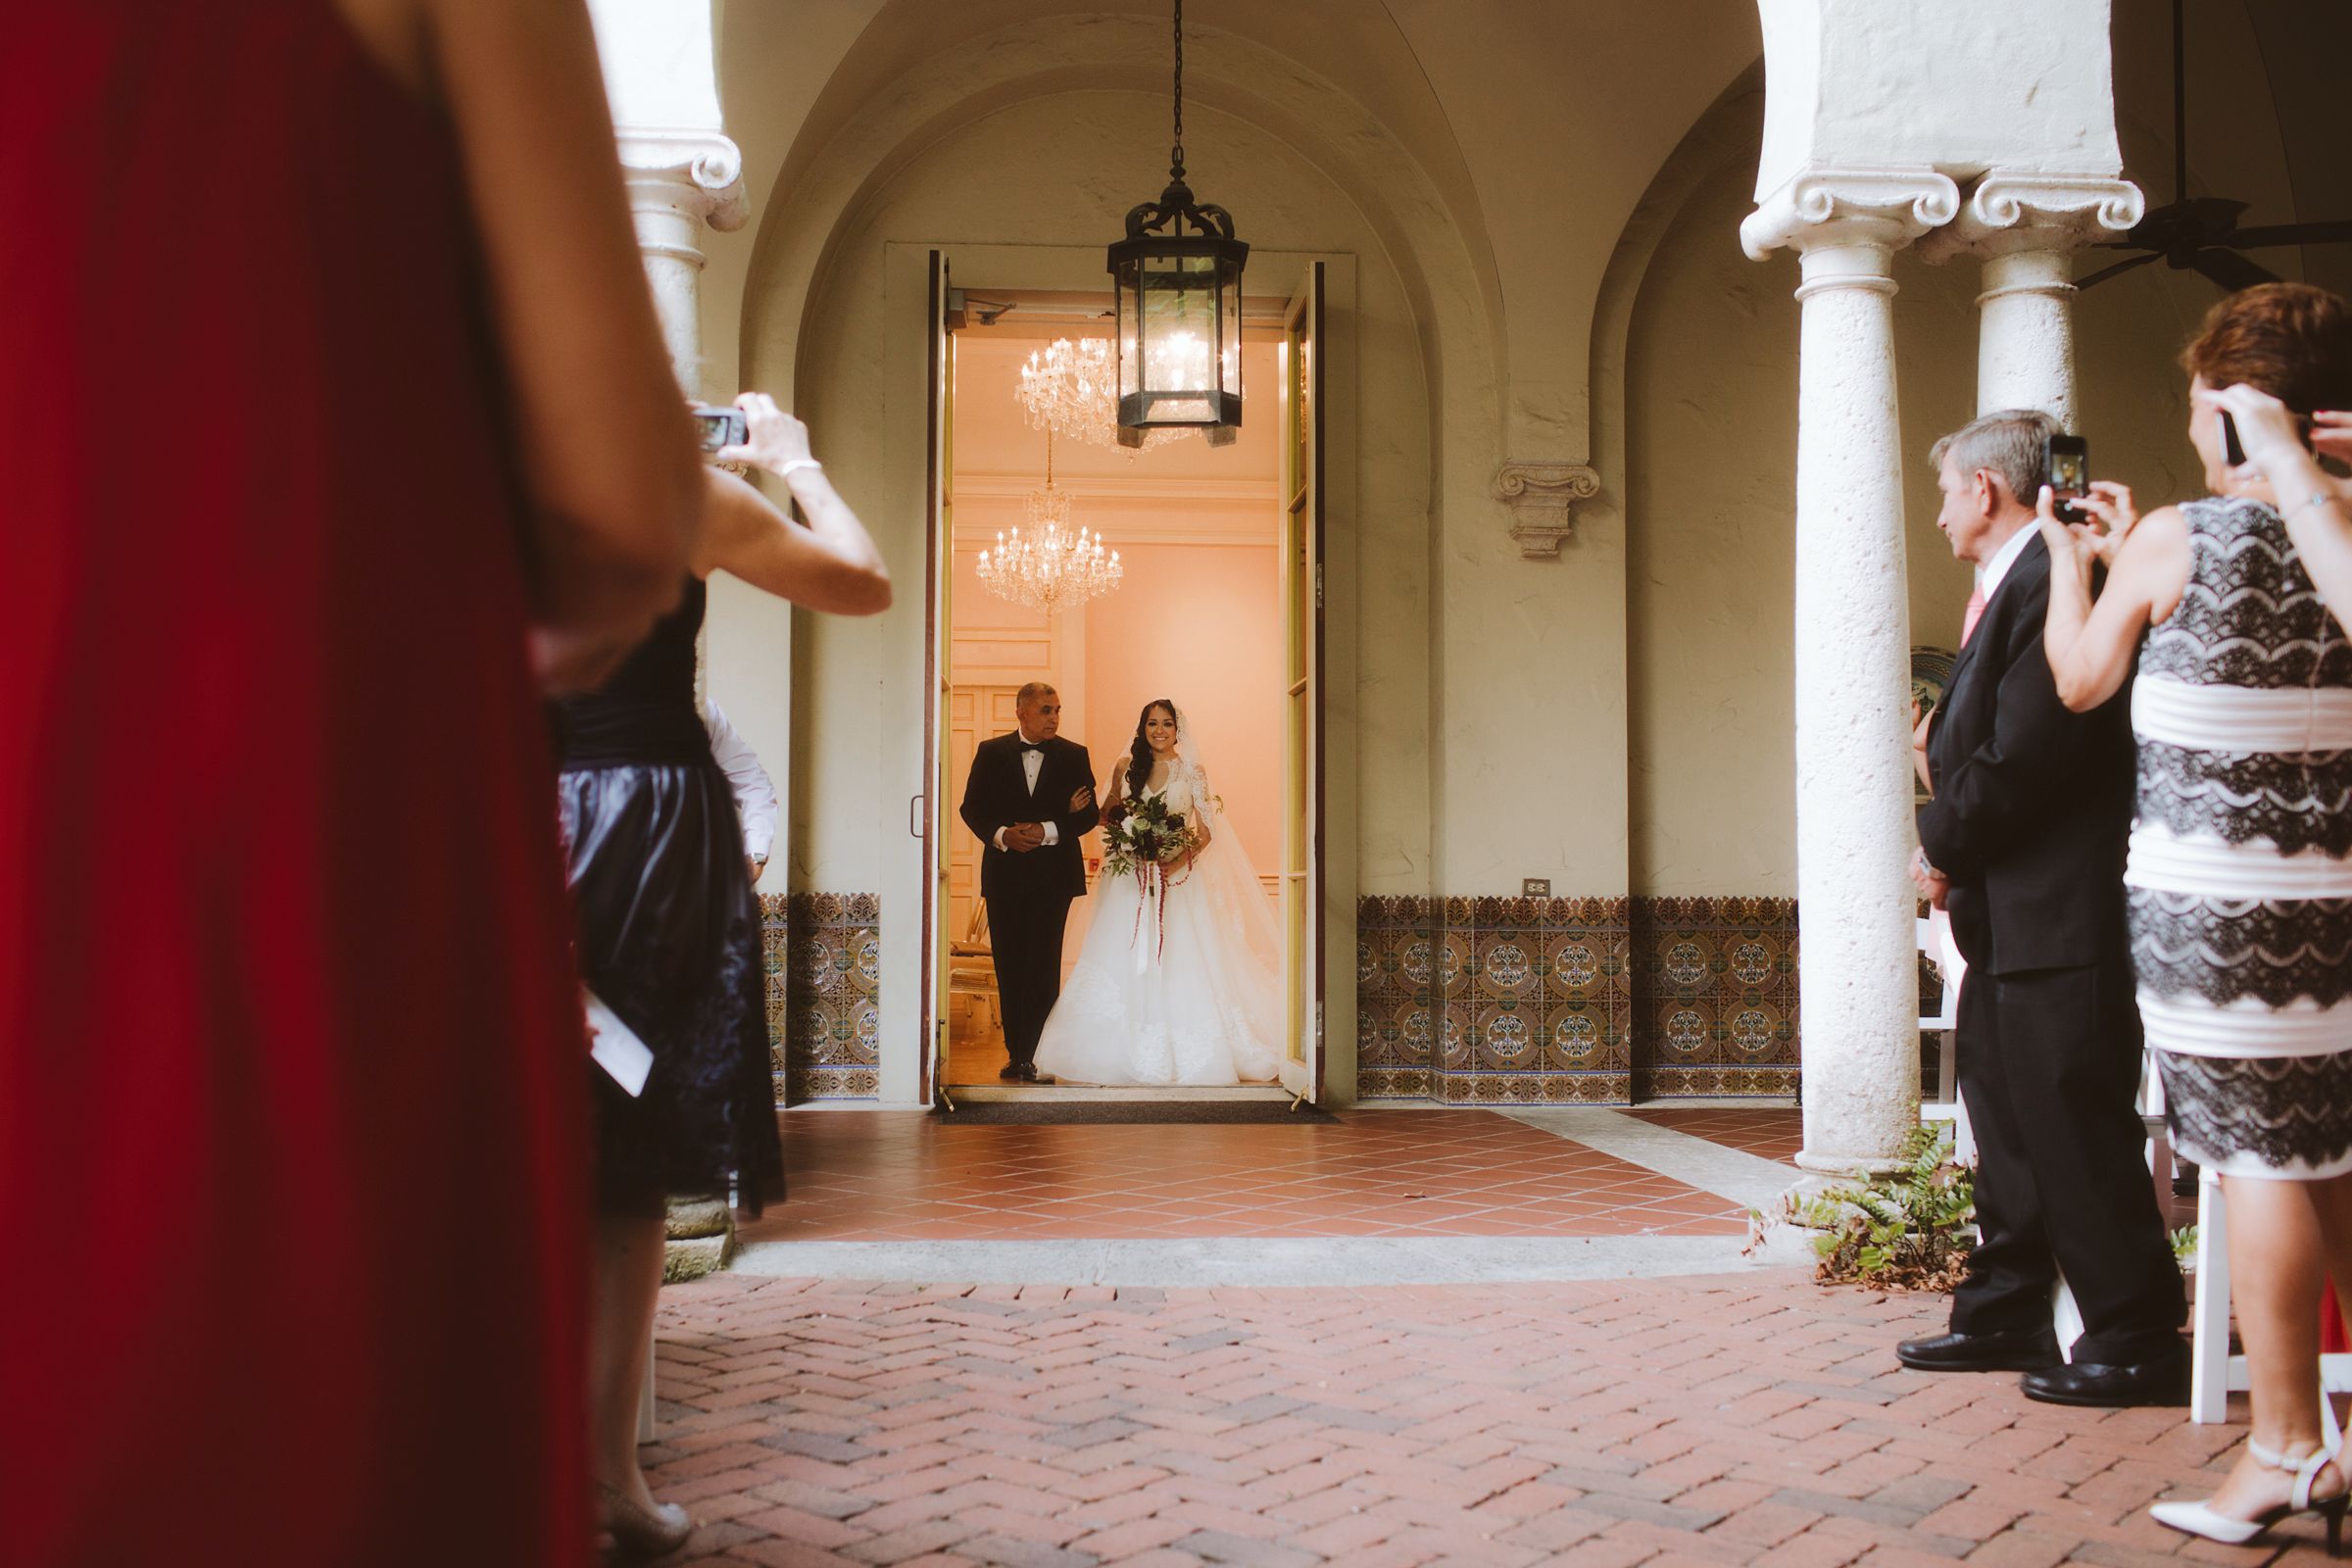 wedding day | MFA St Pete | Vanessa Boy Photography | vanessaboy.com-323.com |final.jpg